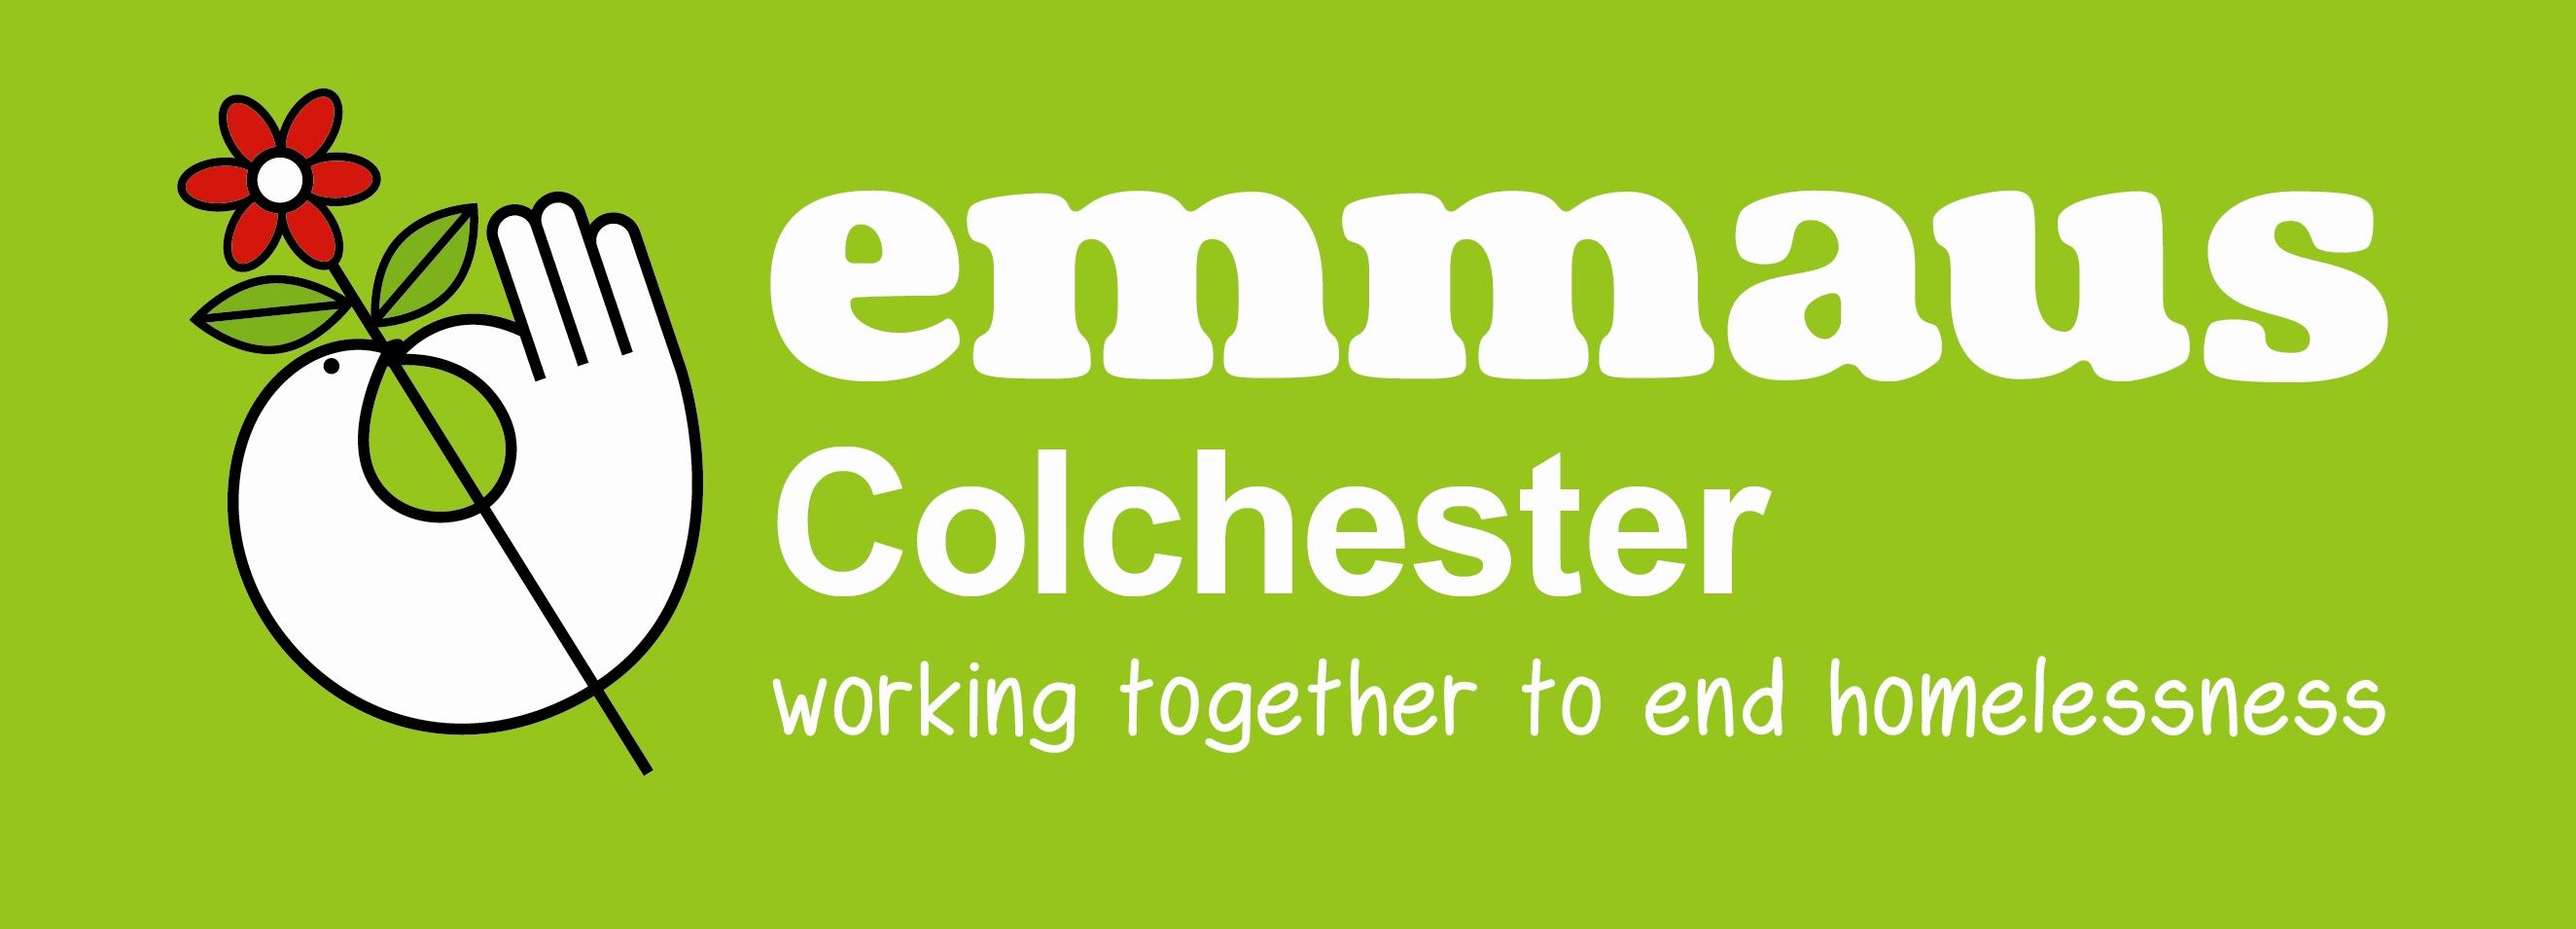 Colchester Branding 1